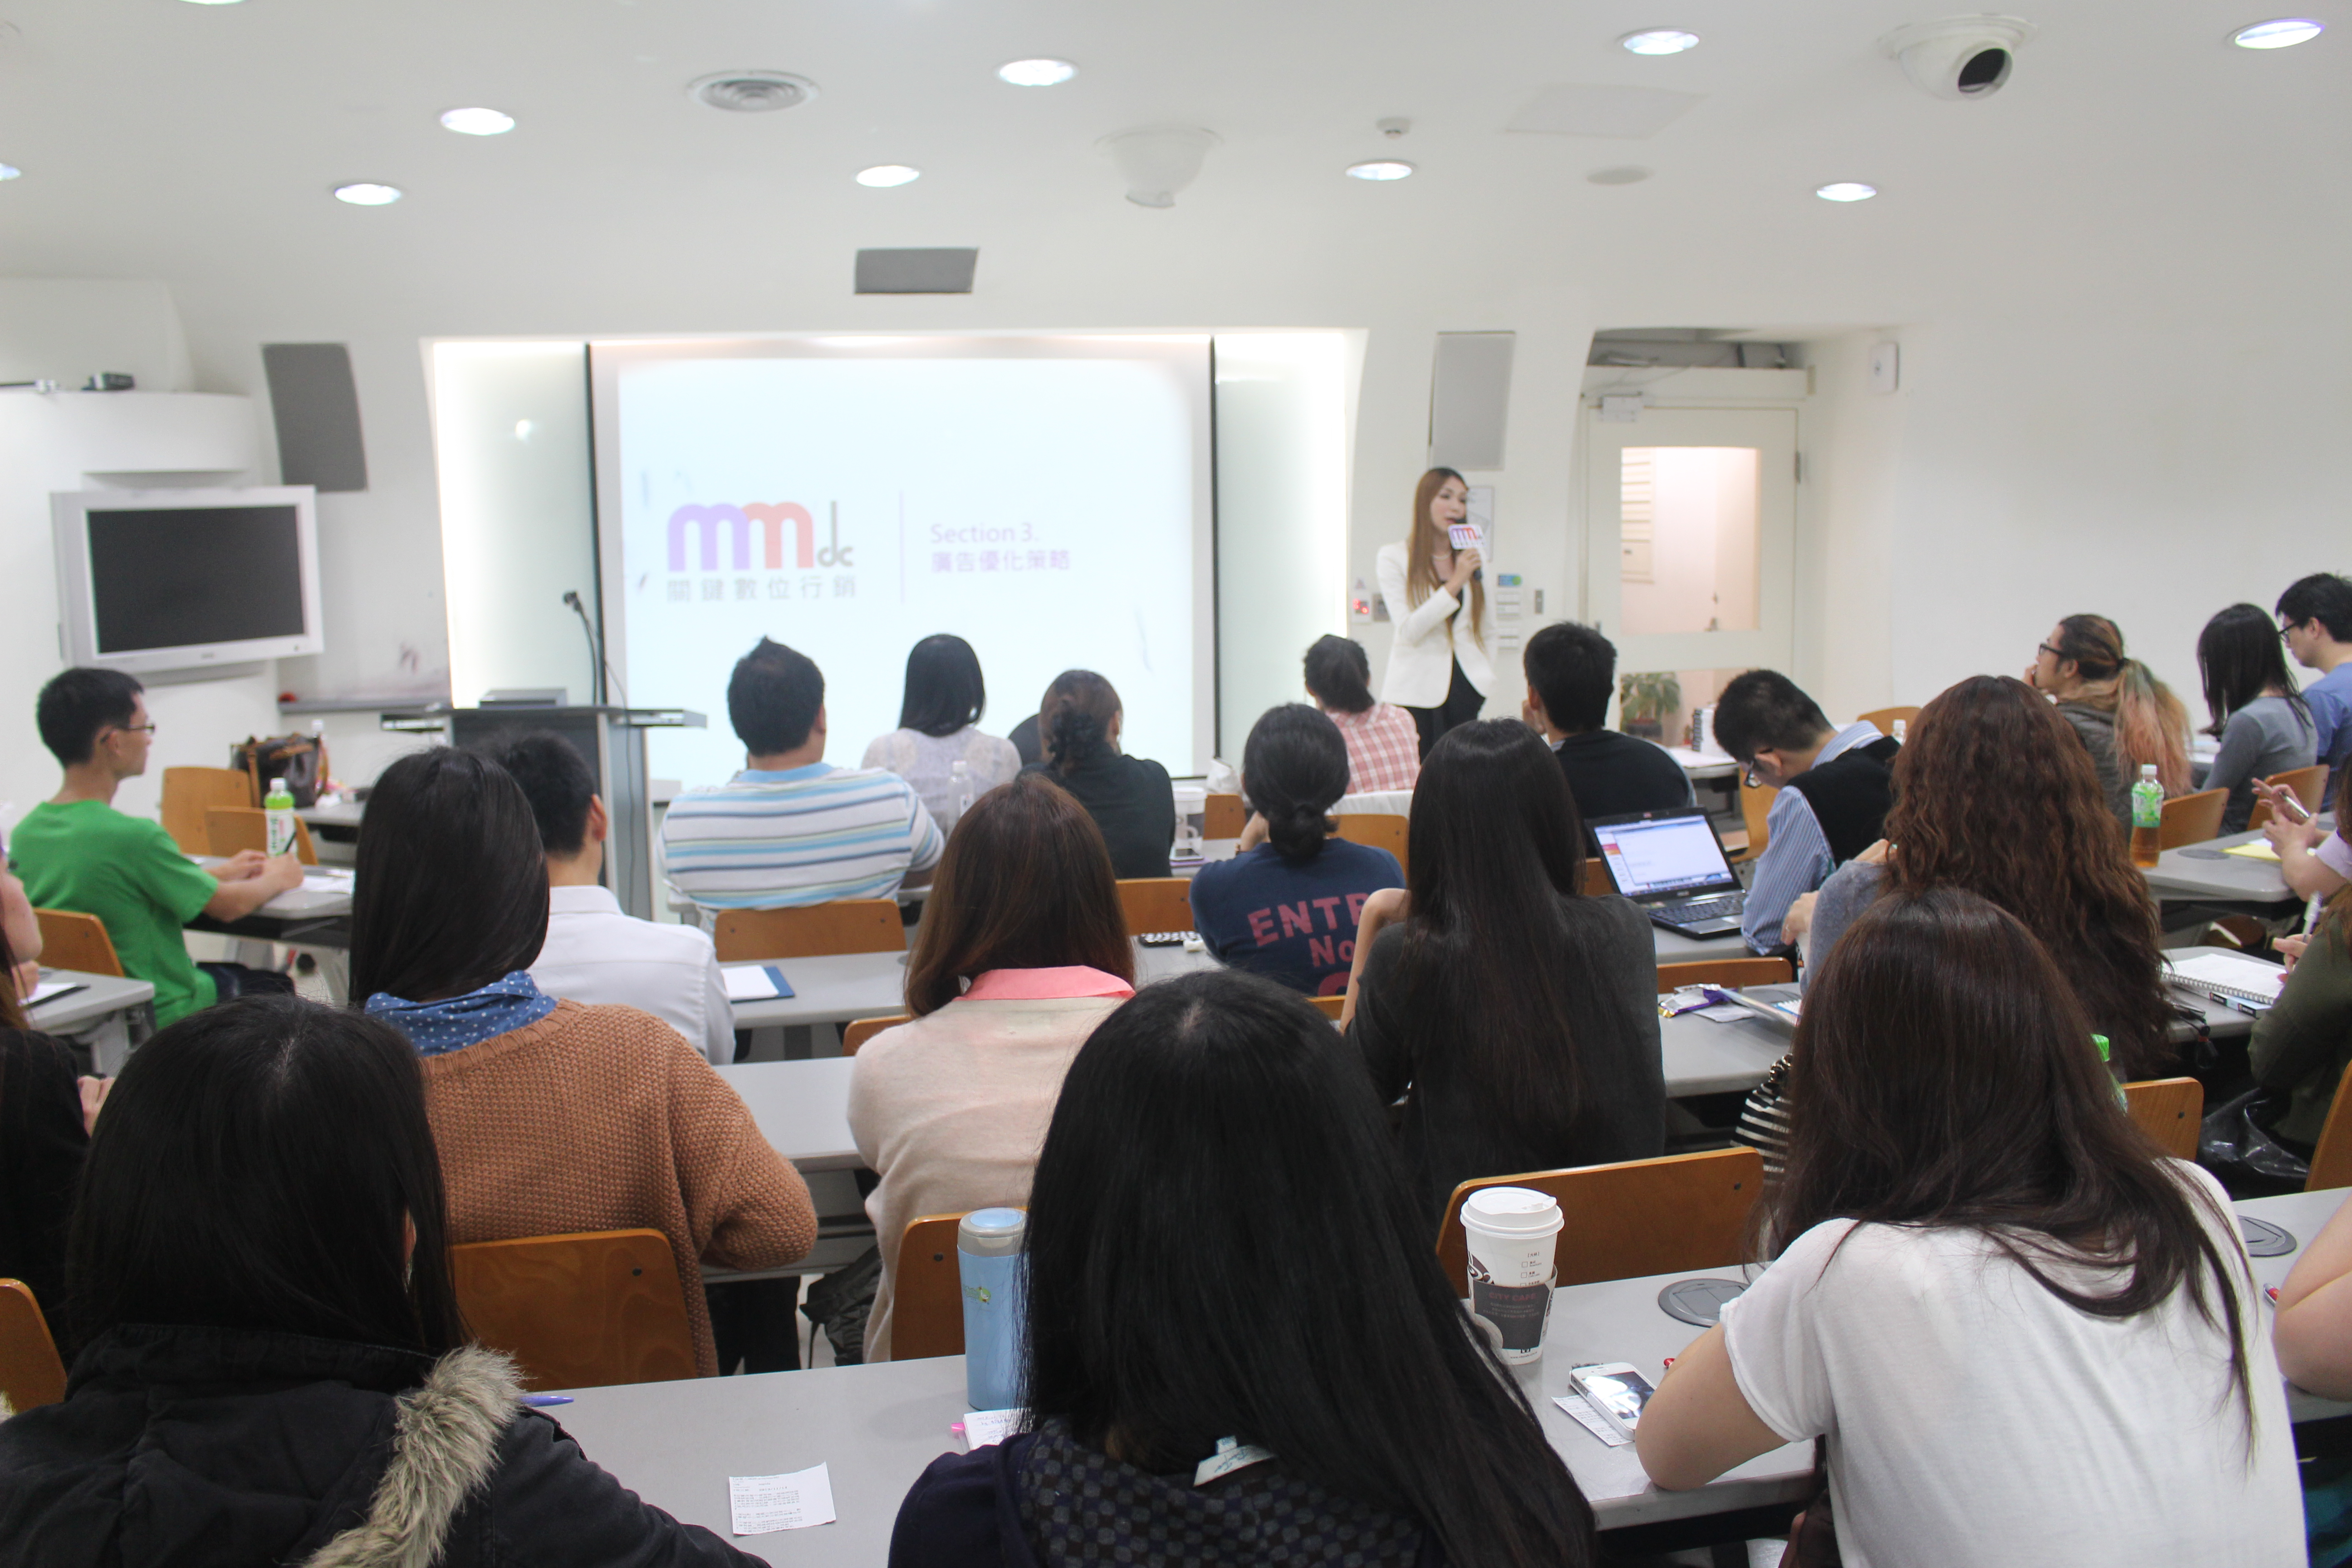 MMdc 數位行銷課程上課實況